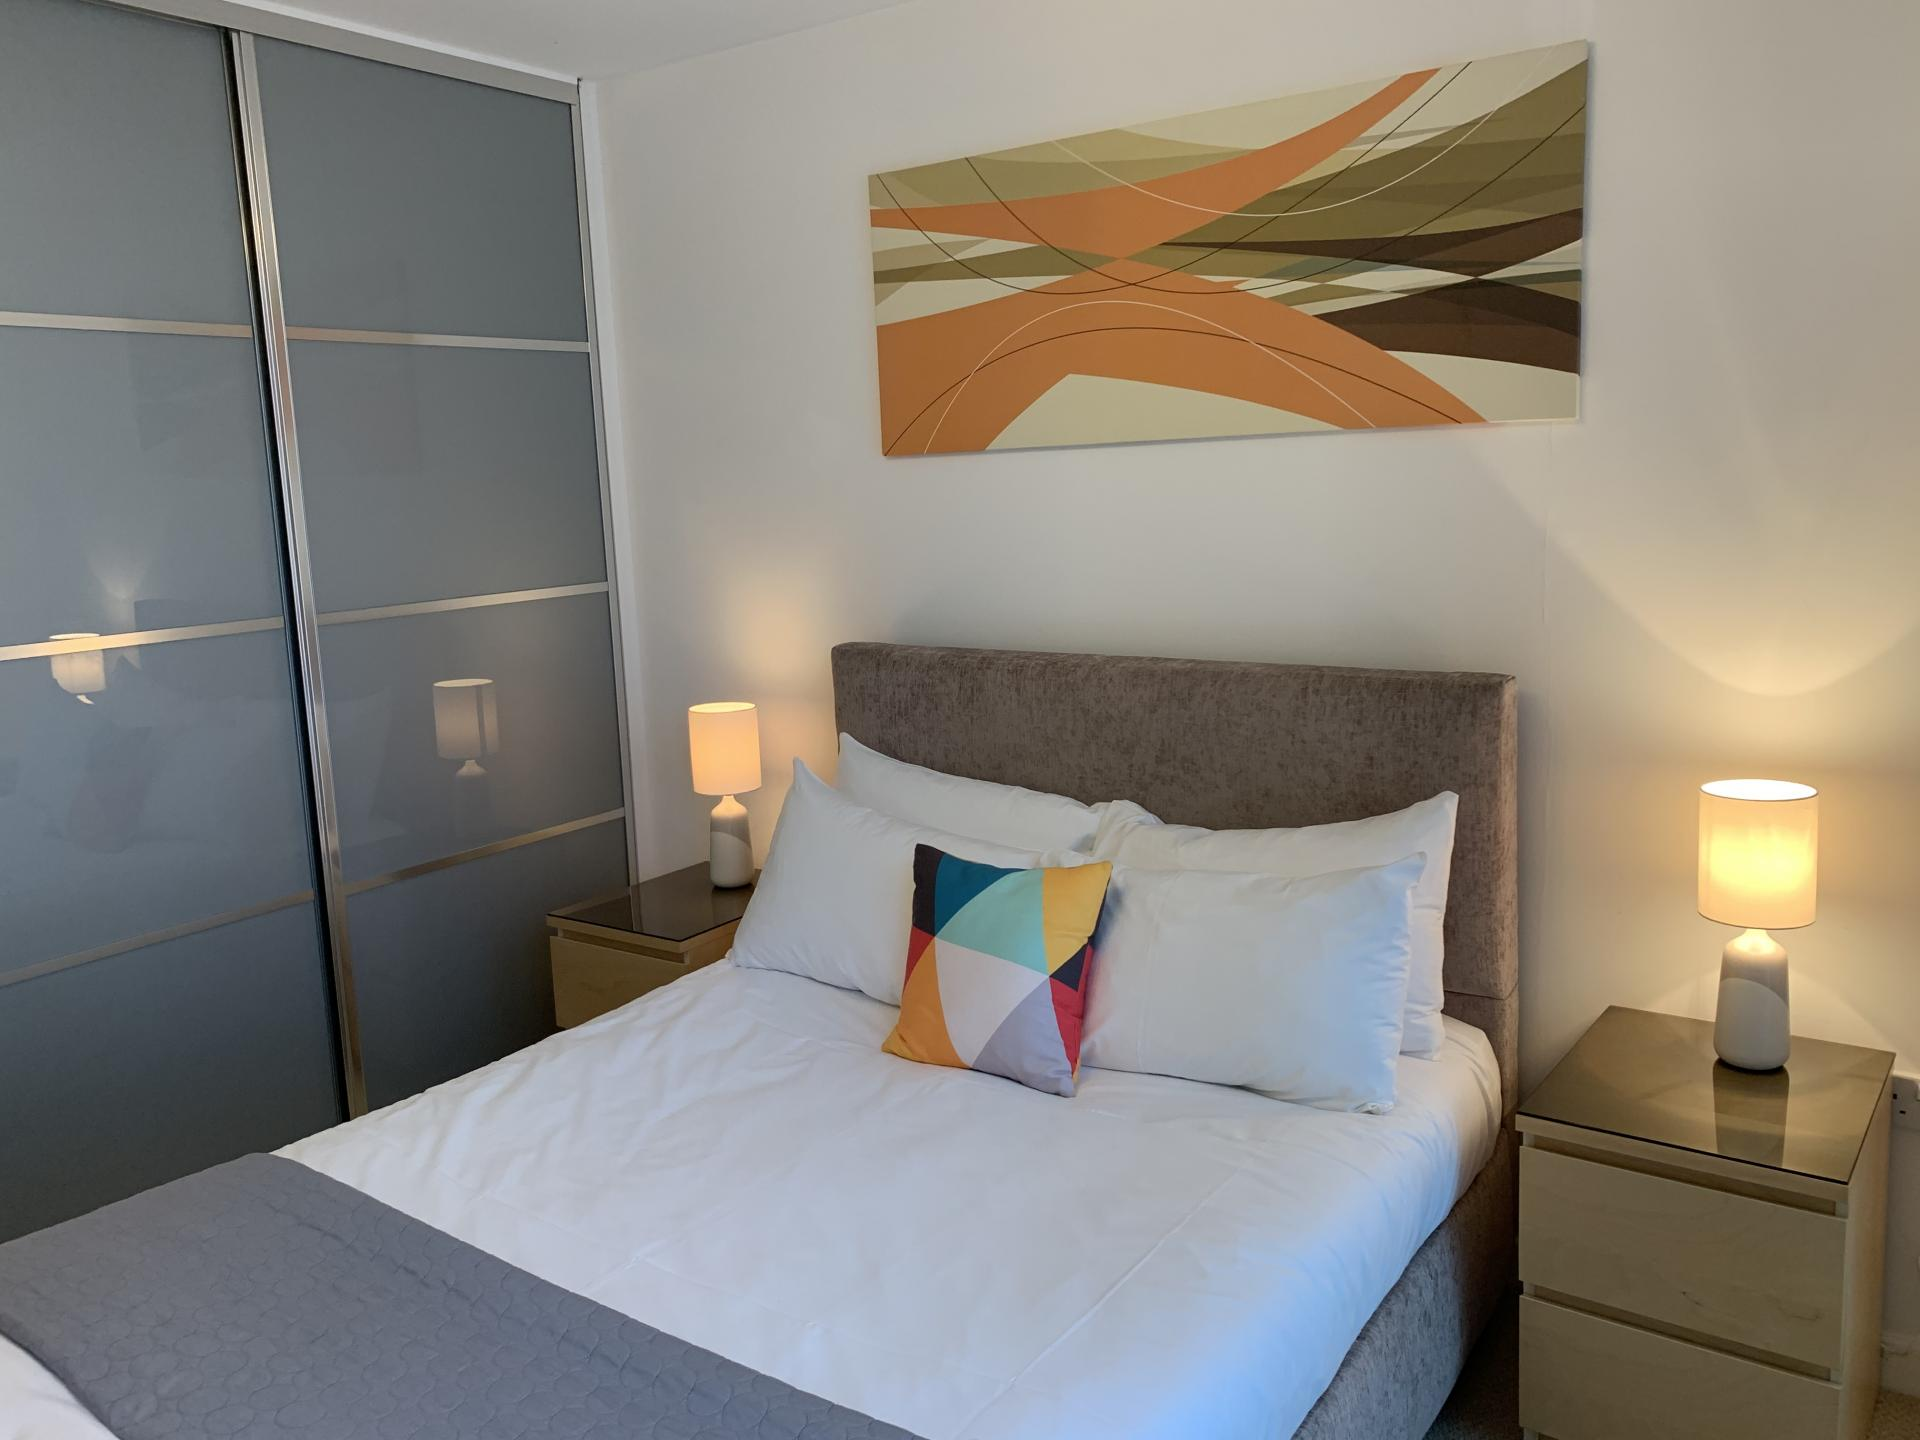 Bedroom at Cotels The Hub Apartments, Centre, Milton Keynes - Citybase Apartments